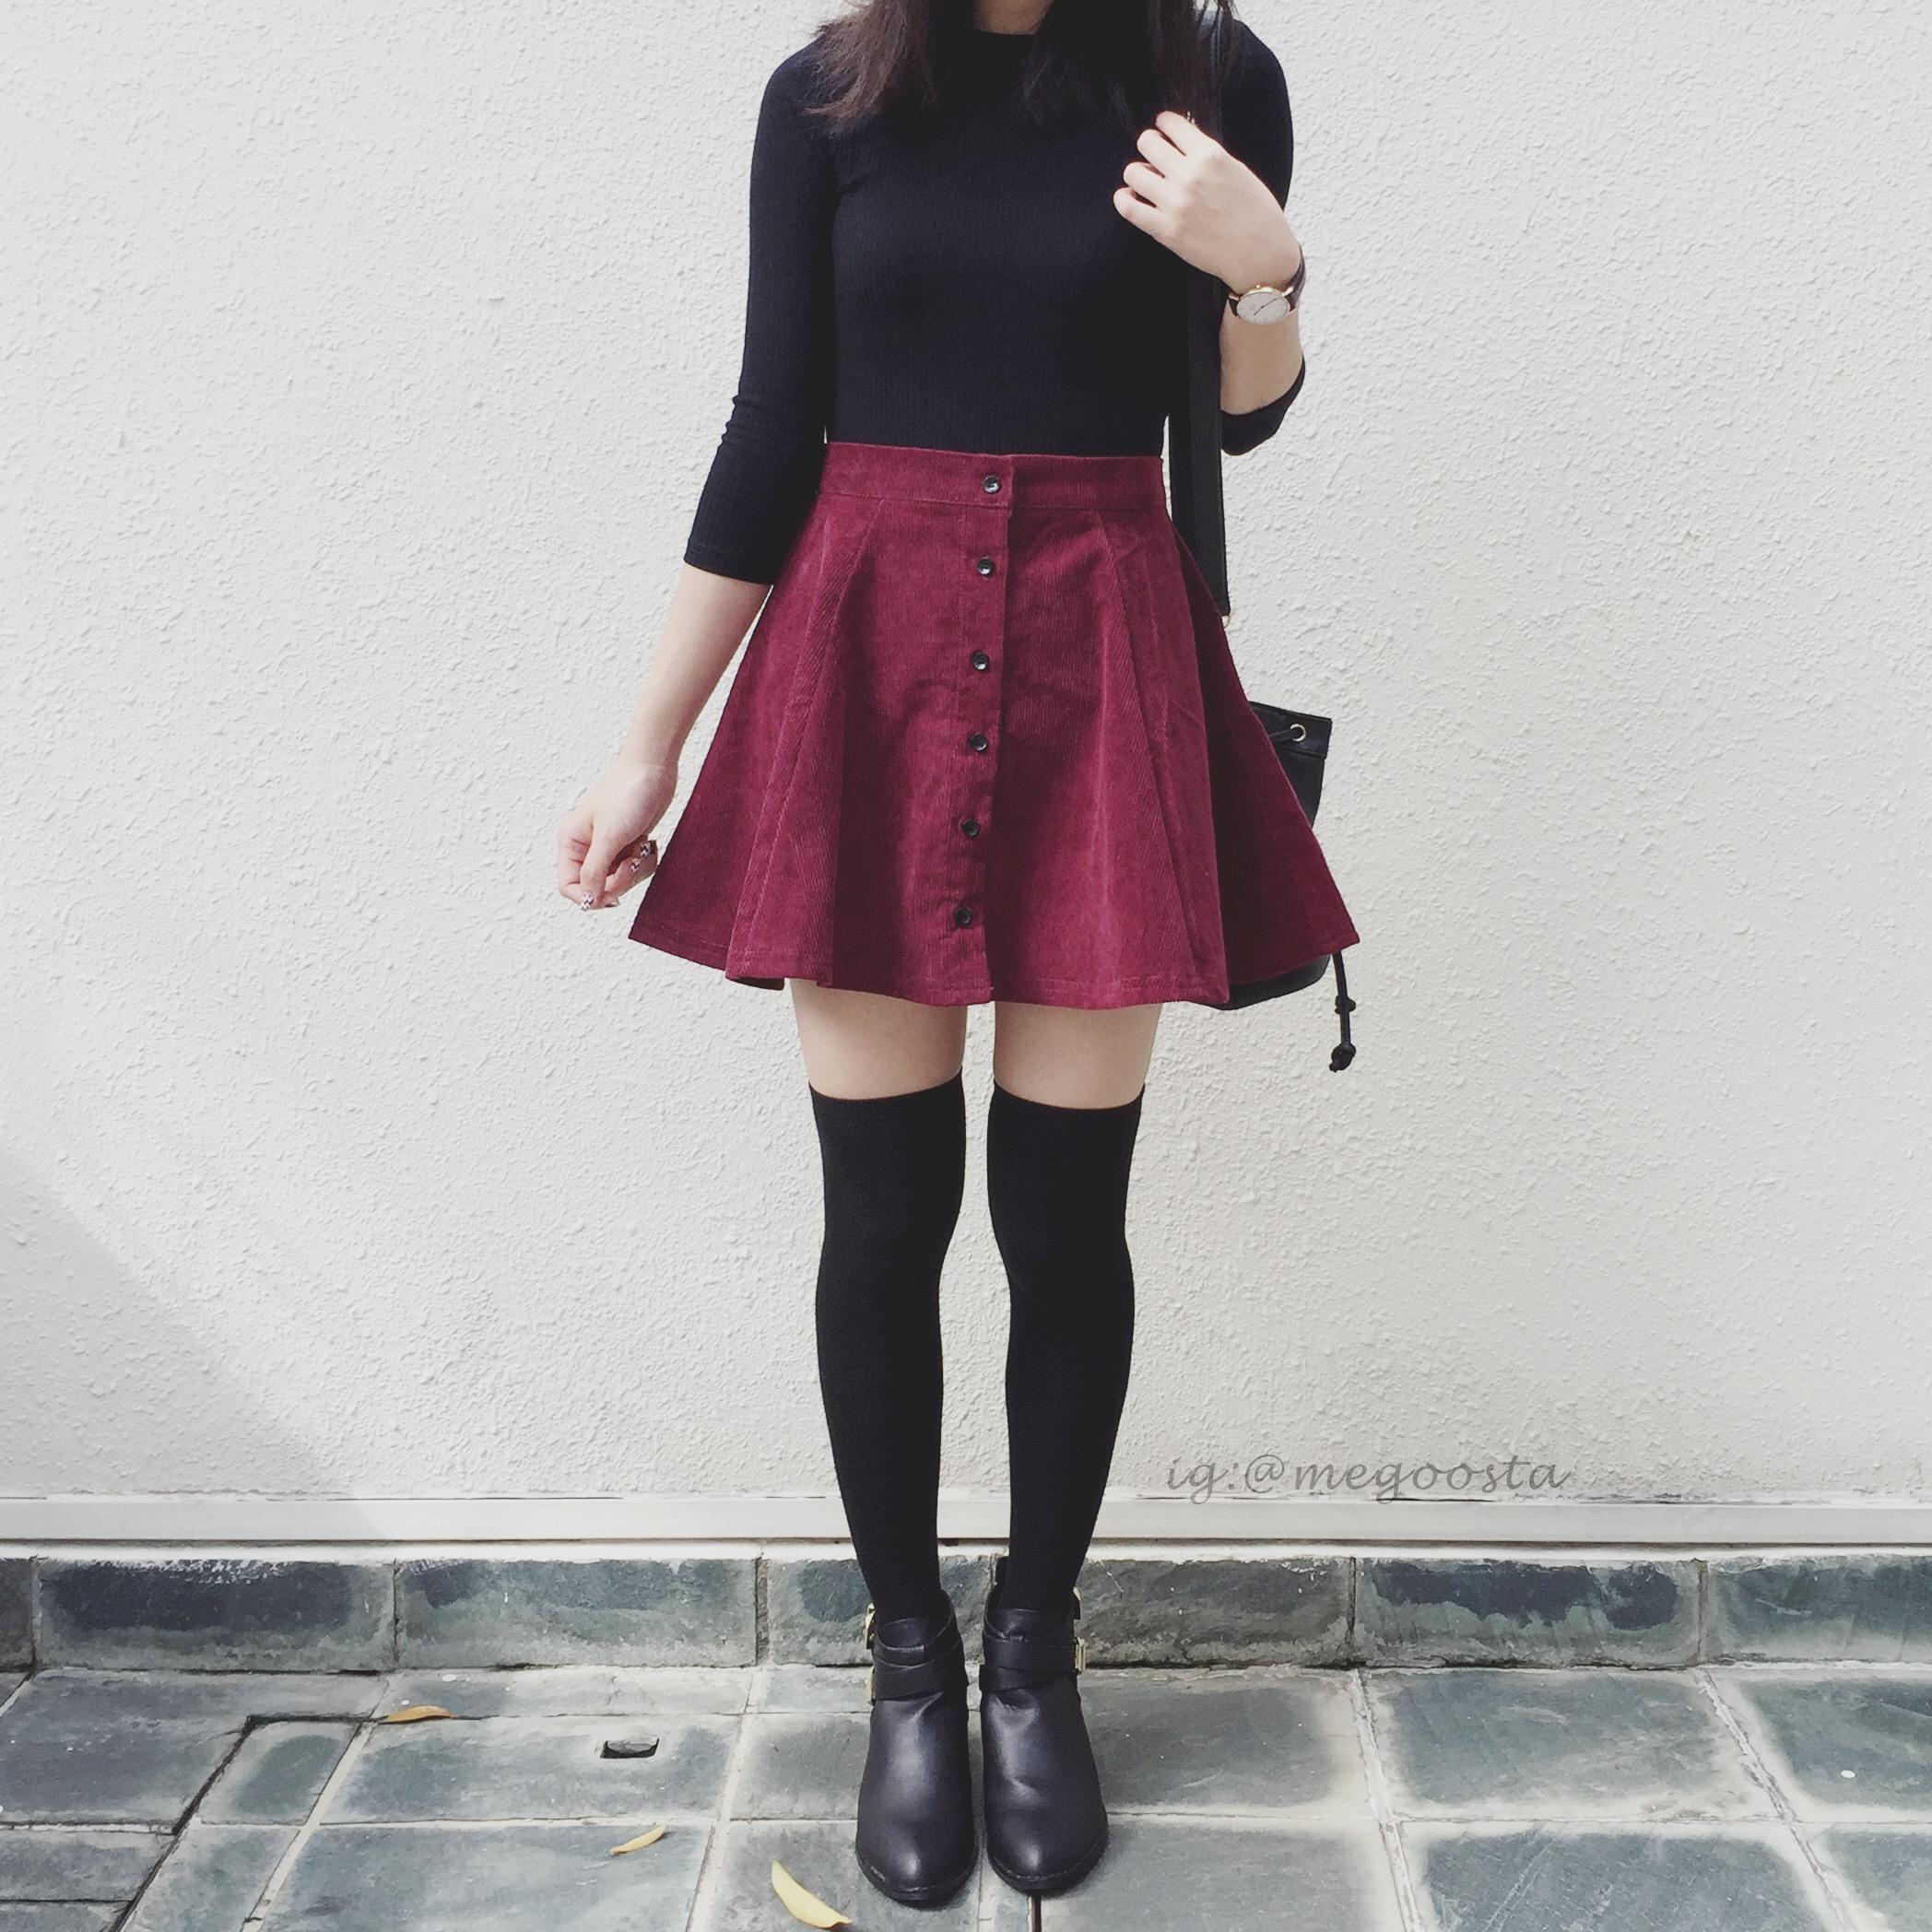 e417cabab3 Corduroy Button Up Skirt (Maroon) · Megoosta Fashion · Free shipping ...